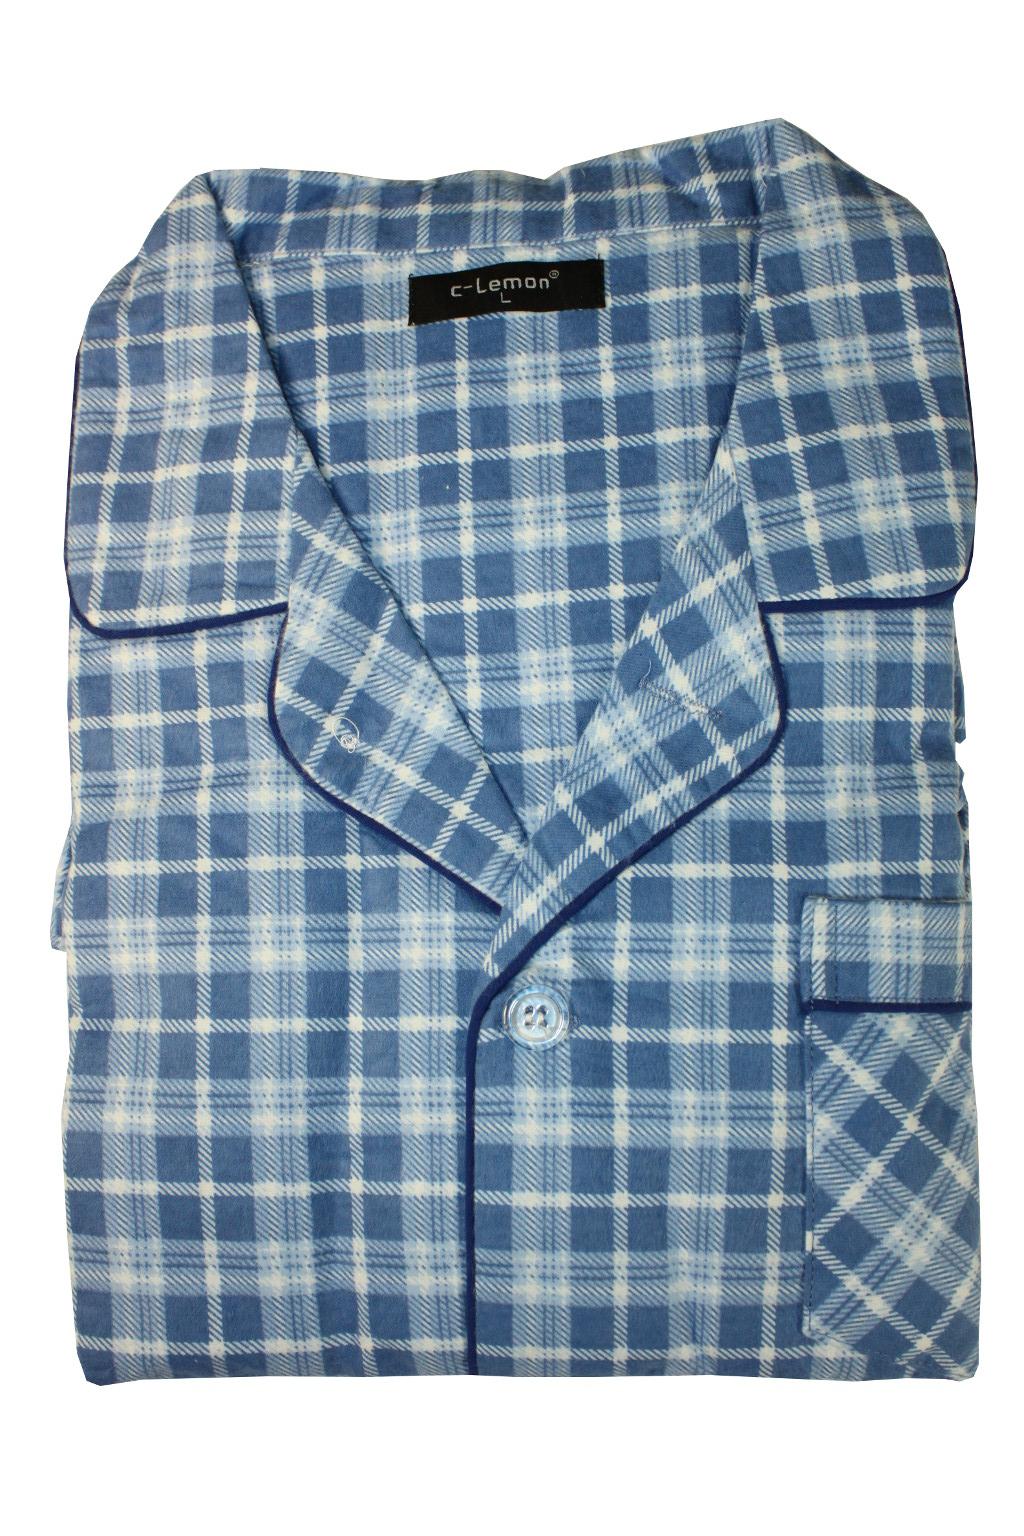 Regan teplé pánské pyžamo M modrá